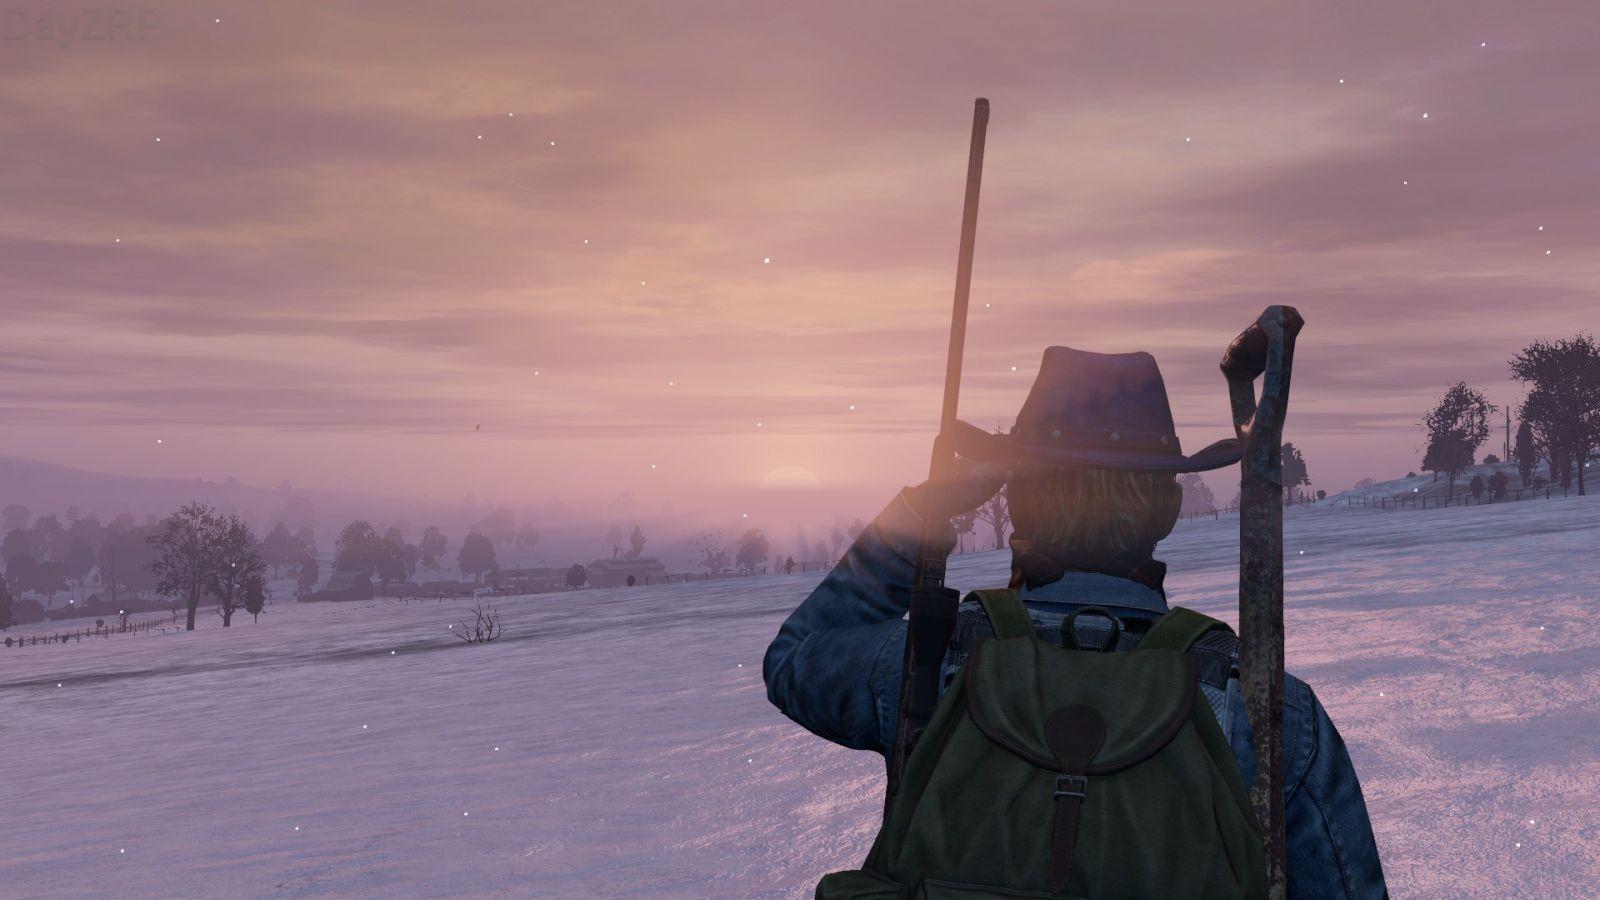 Something great on the horizon